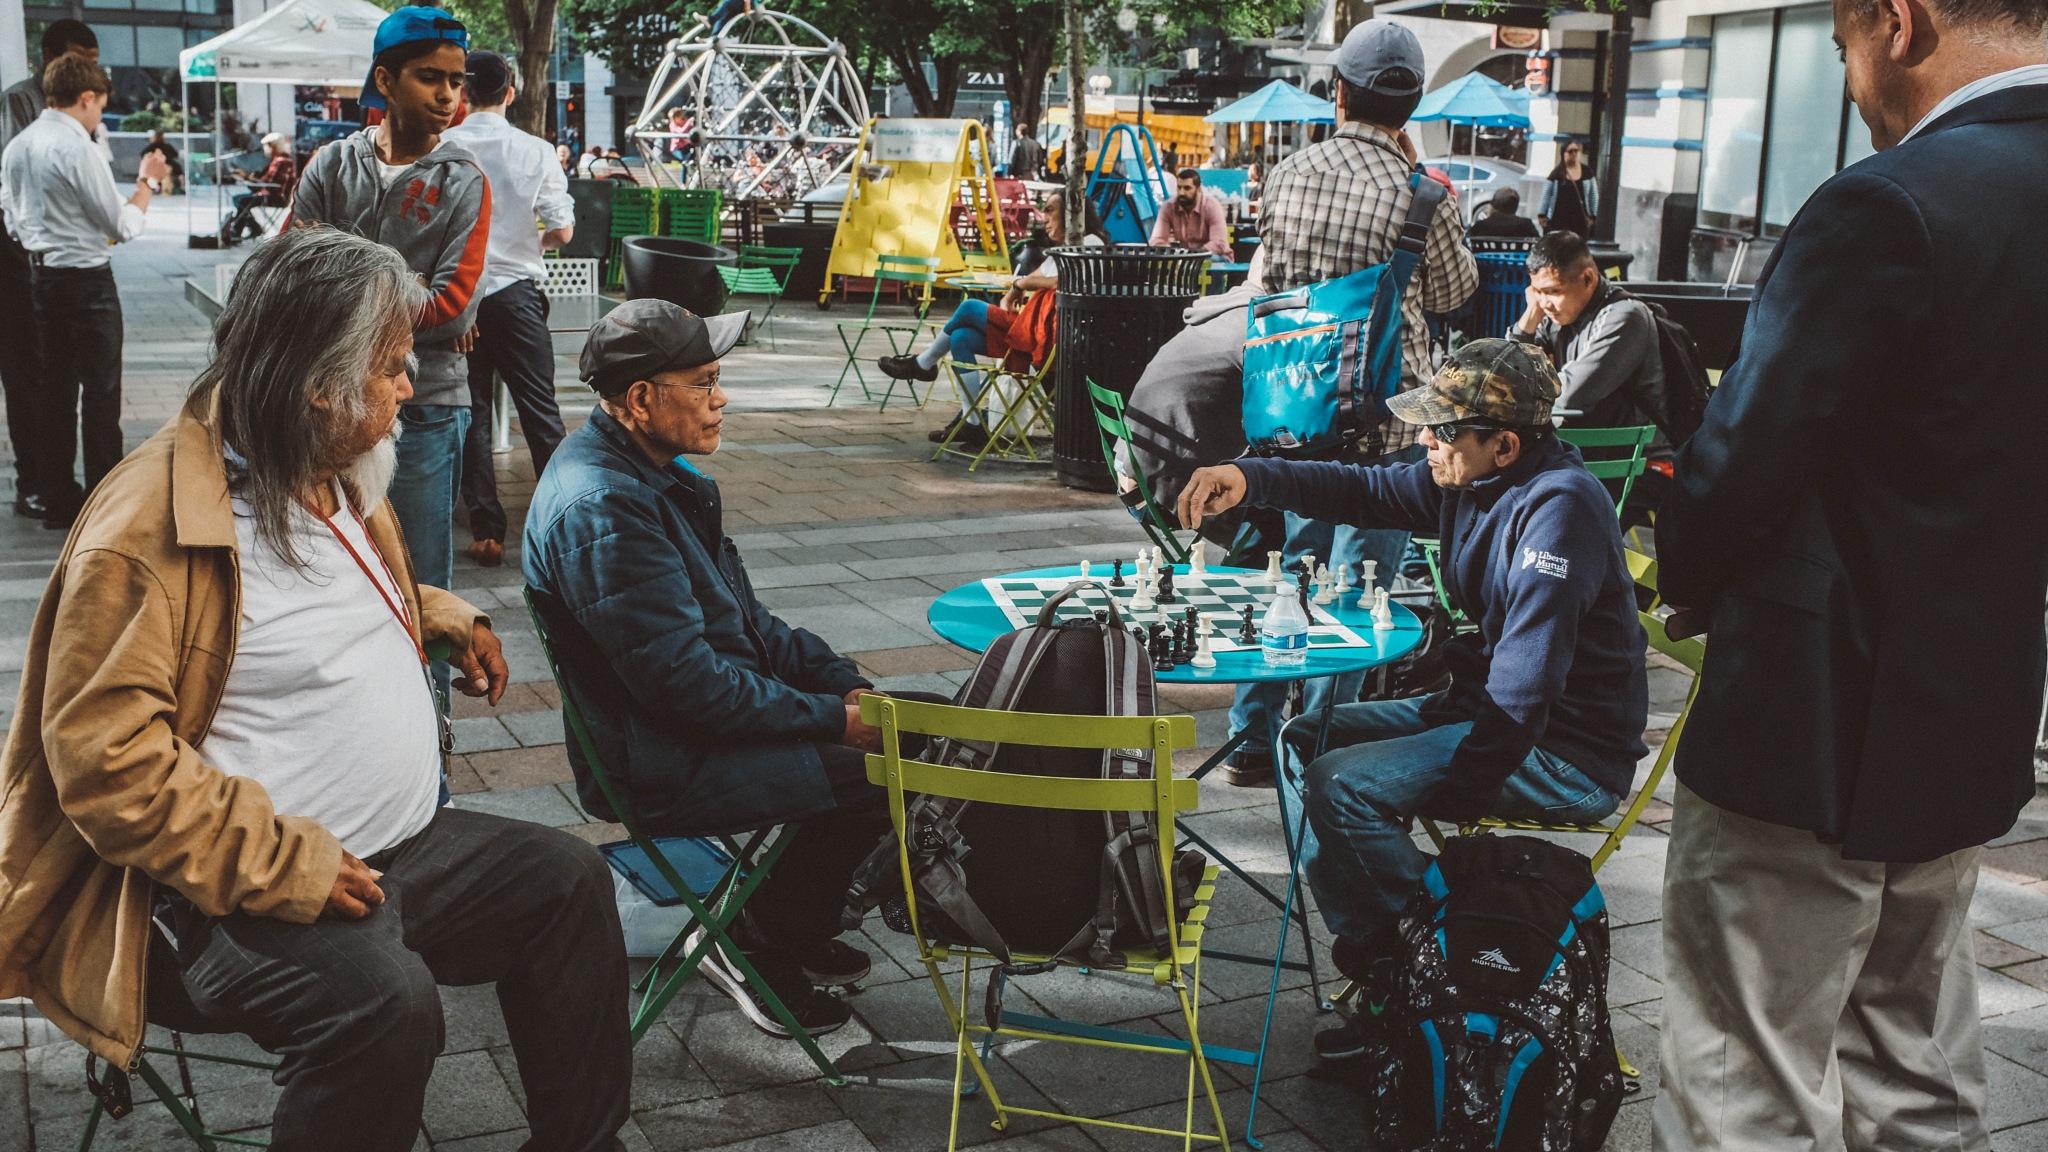 Urban Chess Players by photoigorsolovey